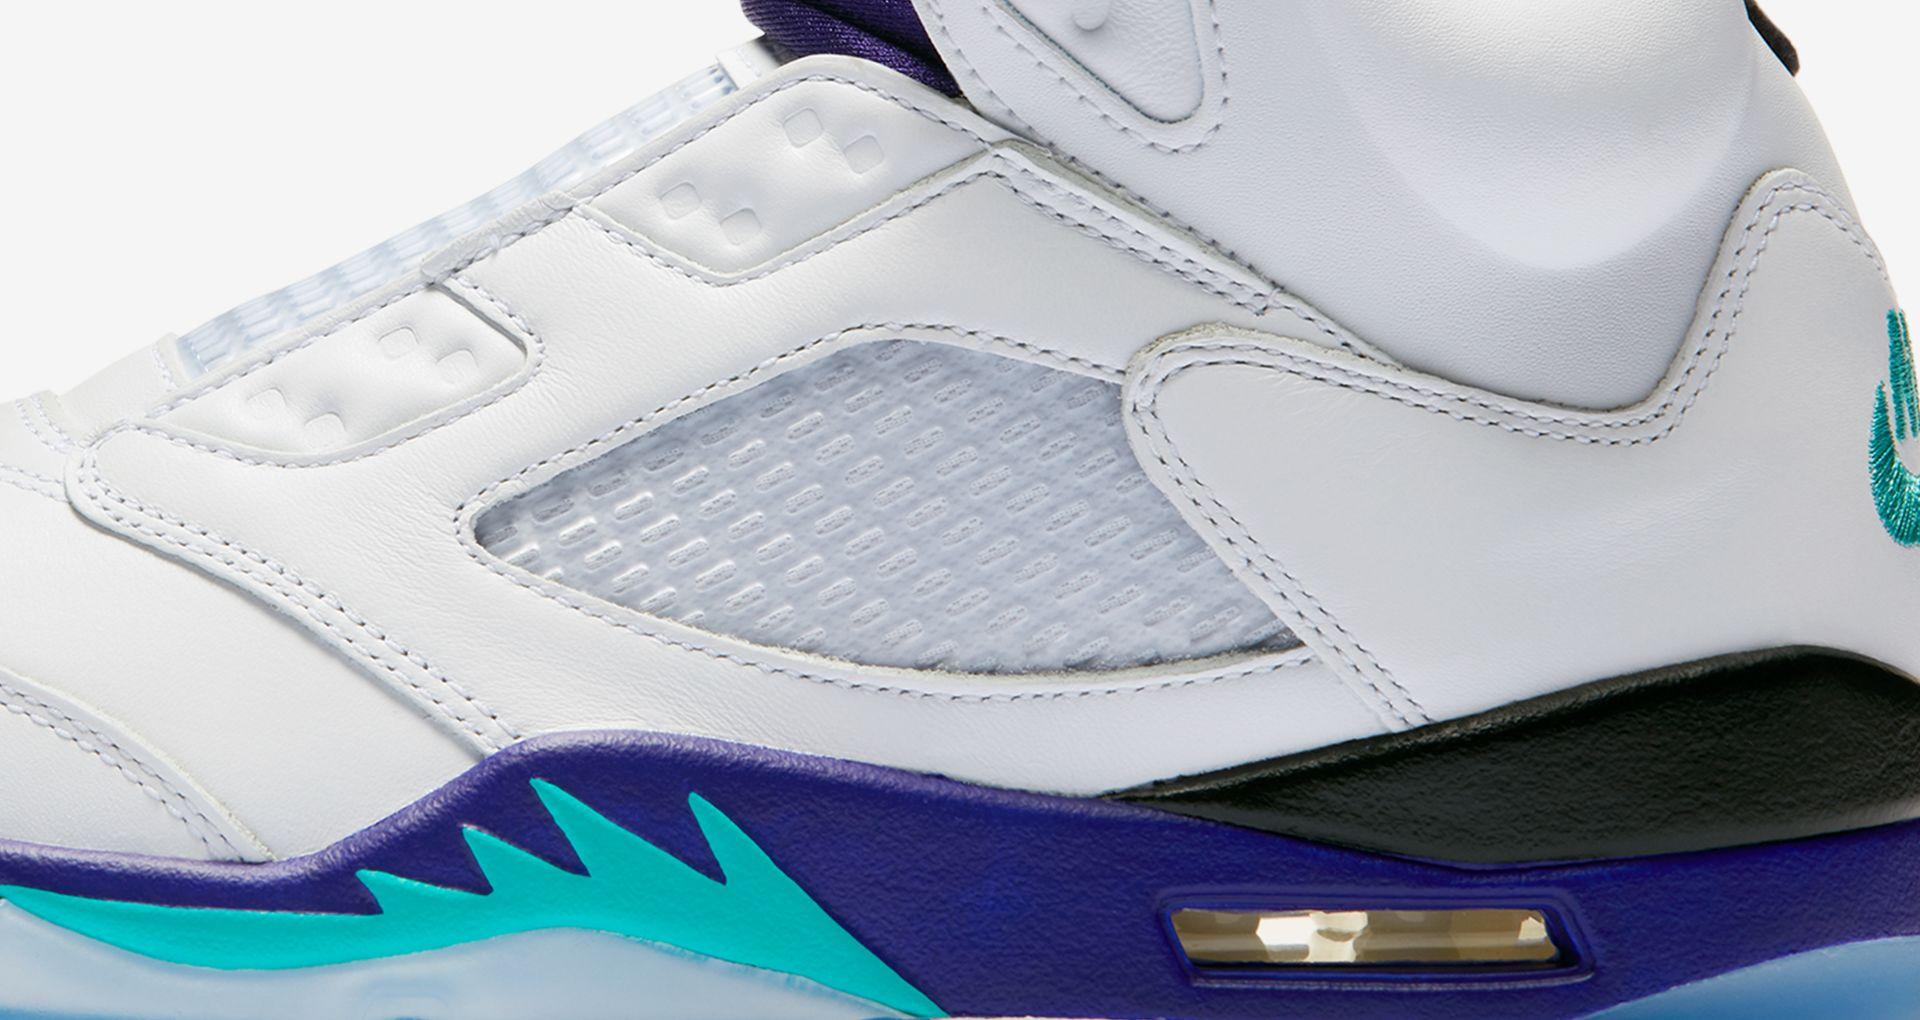 san francisco 33ef8 20506 Air Jordan 5 'Fresh Prince' Release Date. Nike+ SNKRS